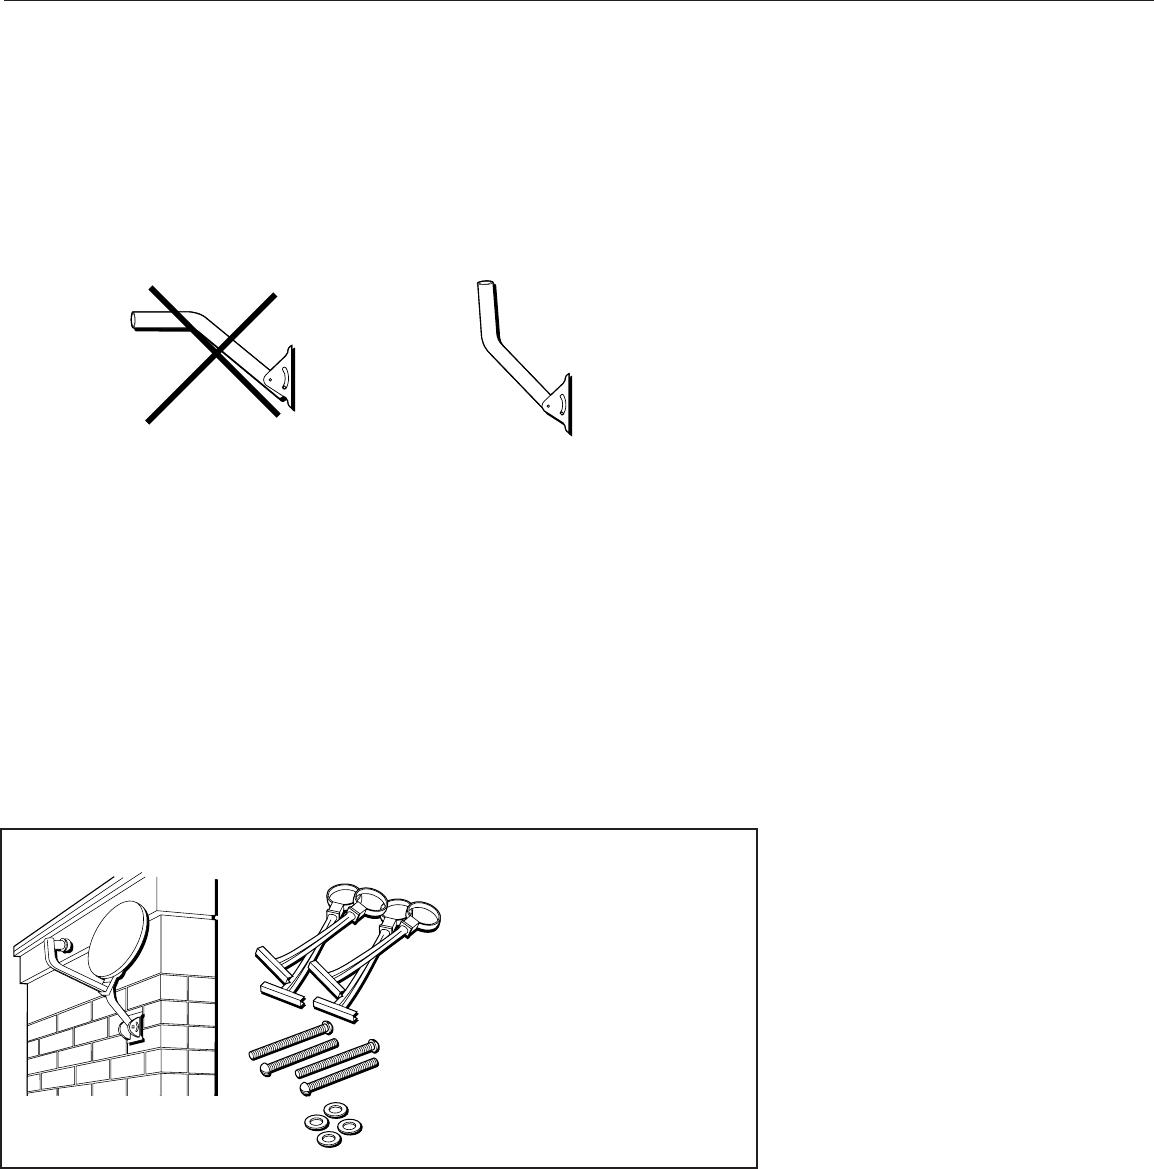 RCA Satellite TV Antenna 15347490.00.(cover) User Manual